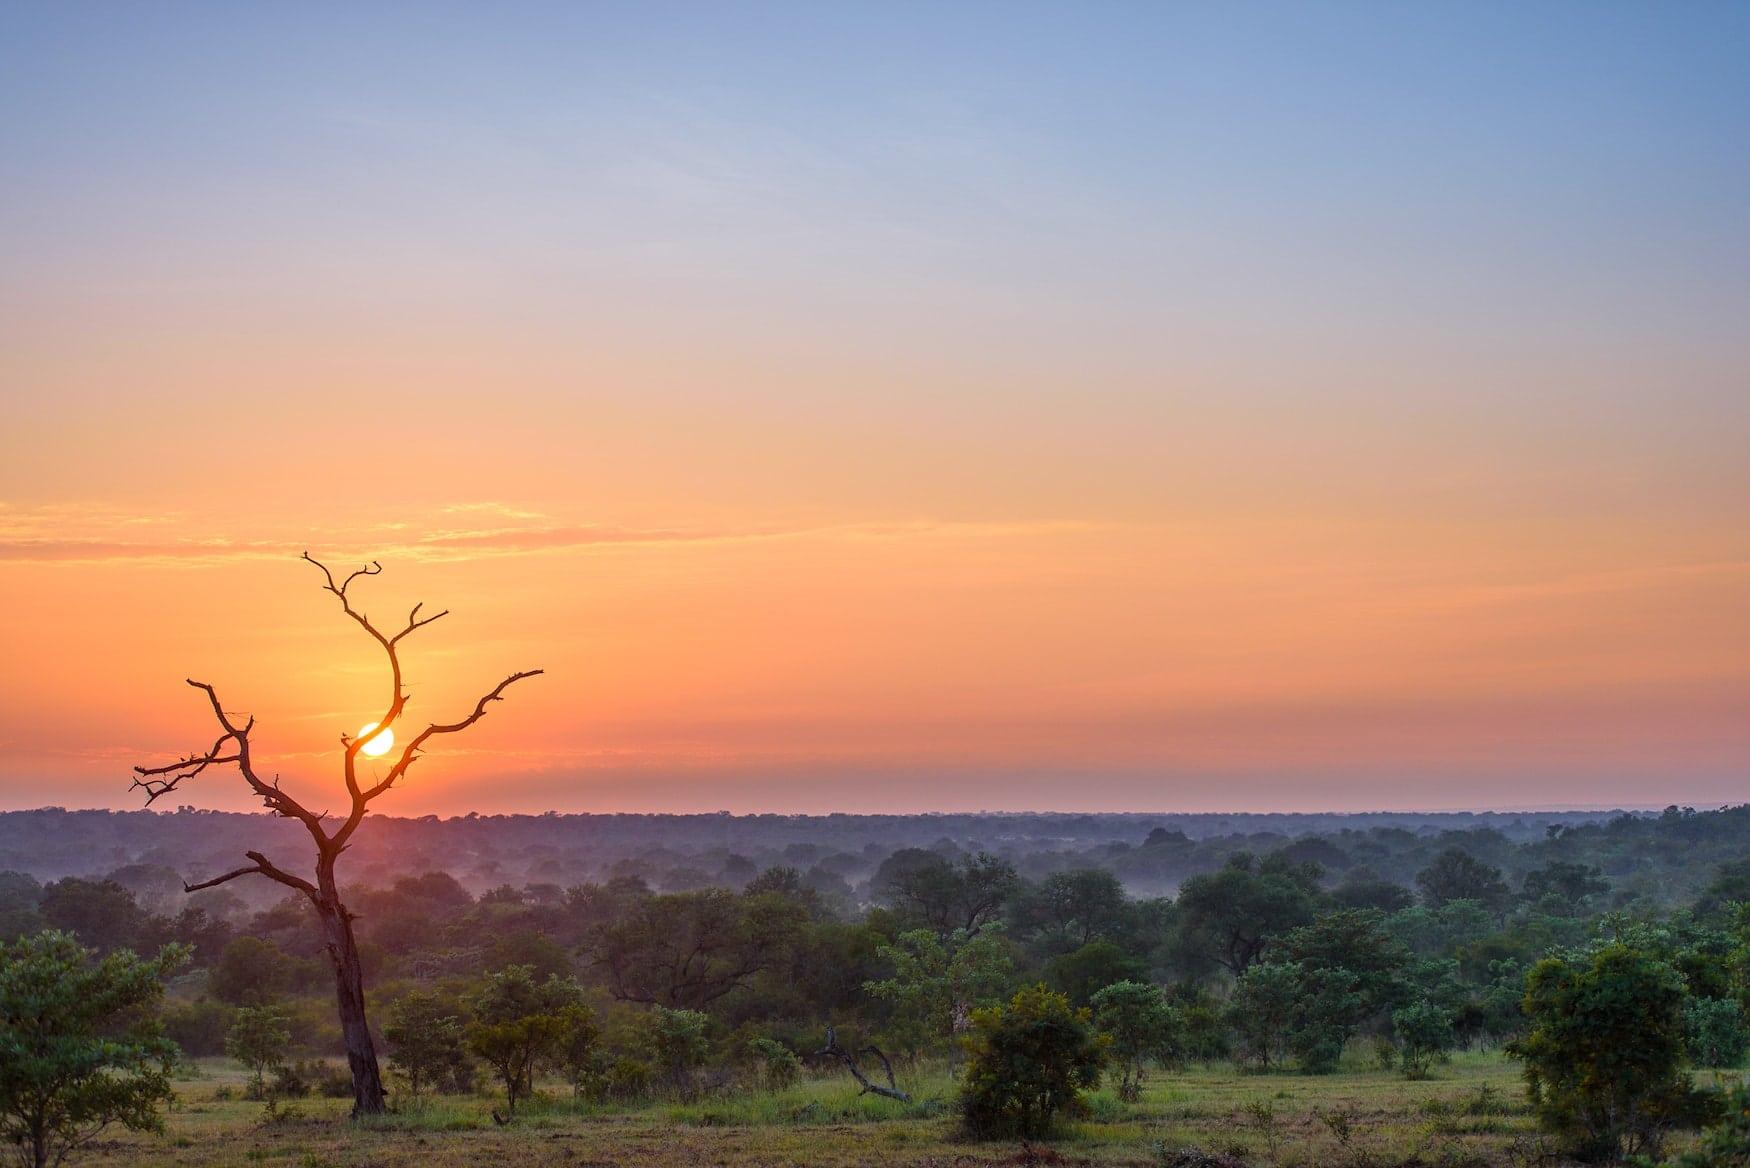 Südafrika, Afrika, Sonnenuntergang, Safari